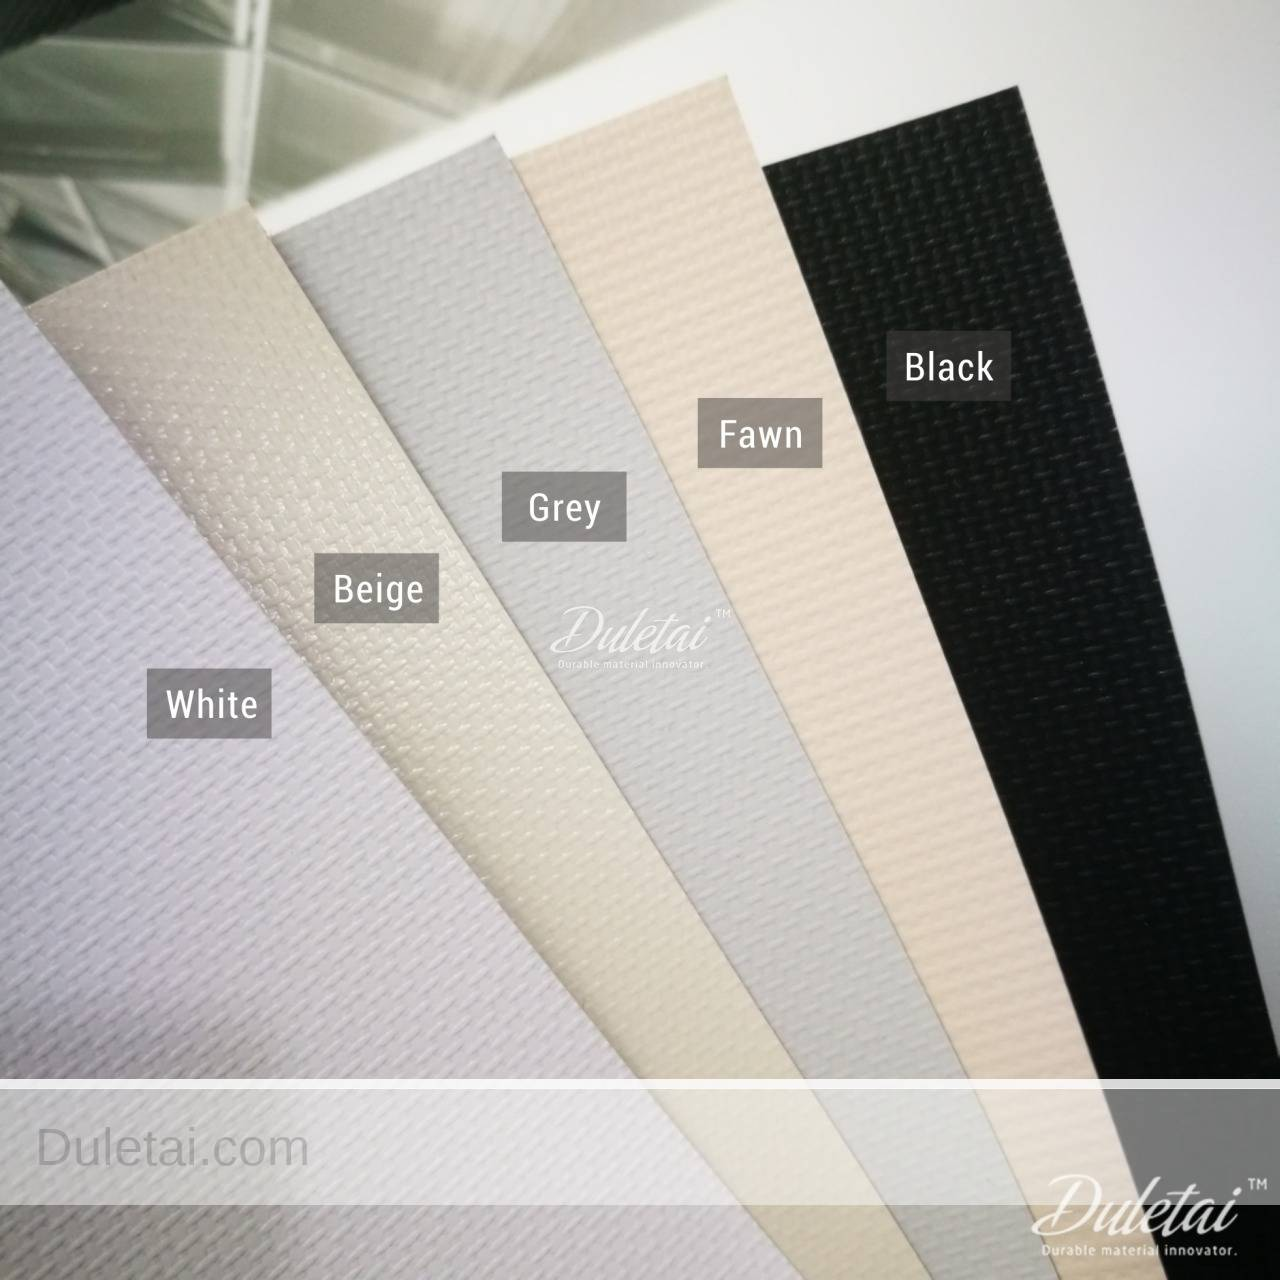 Fiberglass Blackout Blind Material For Window Shades